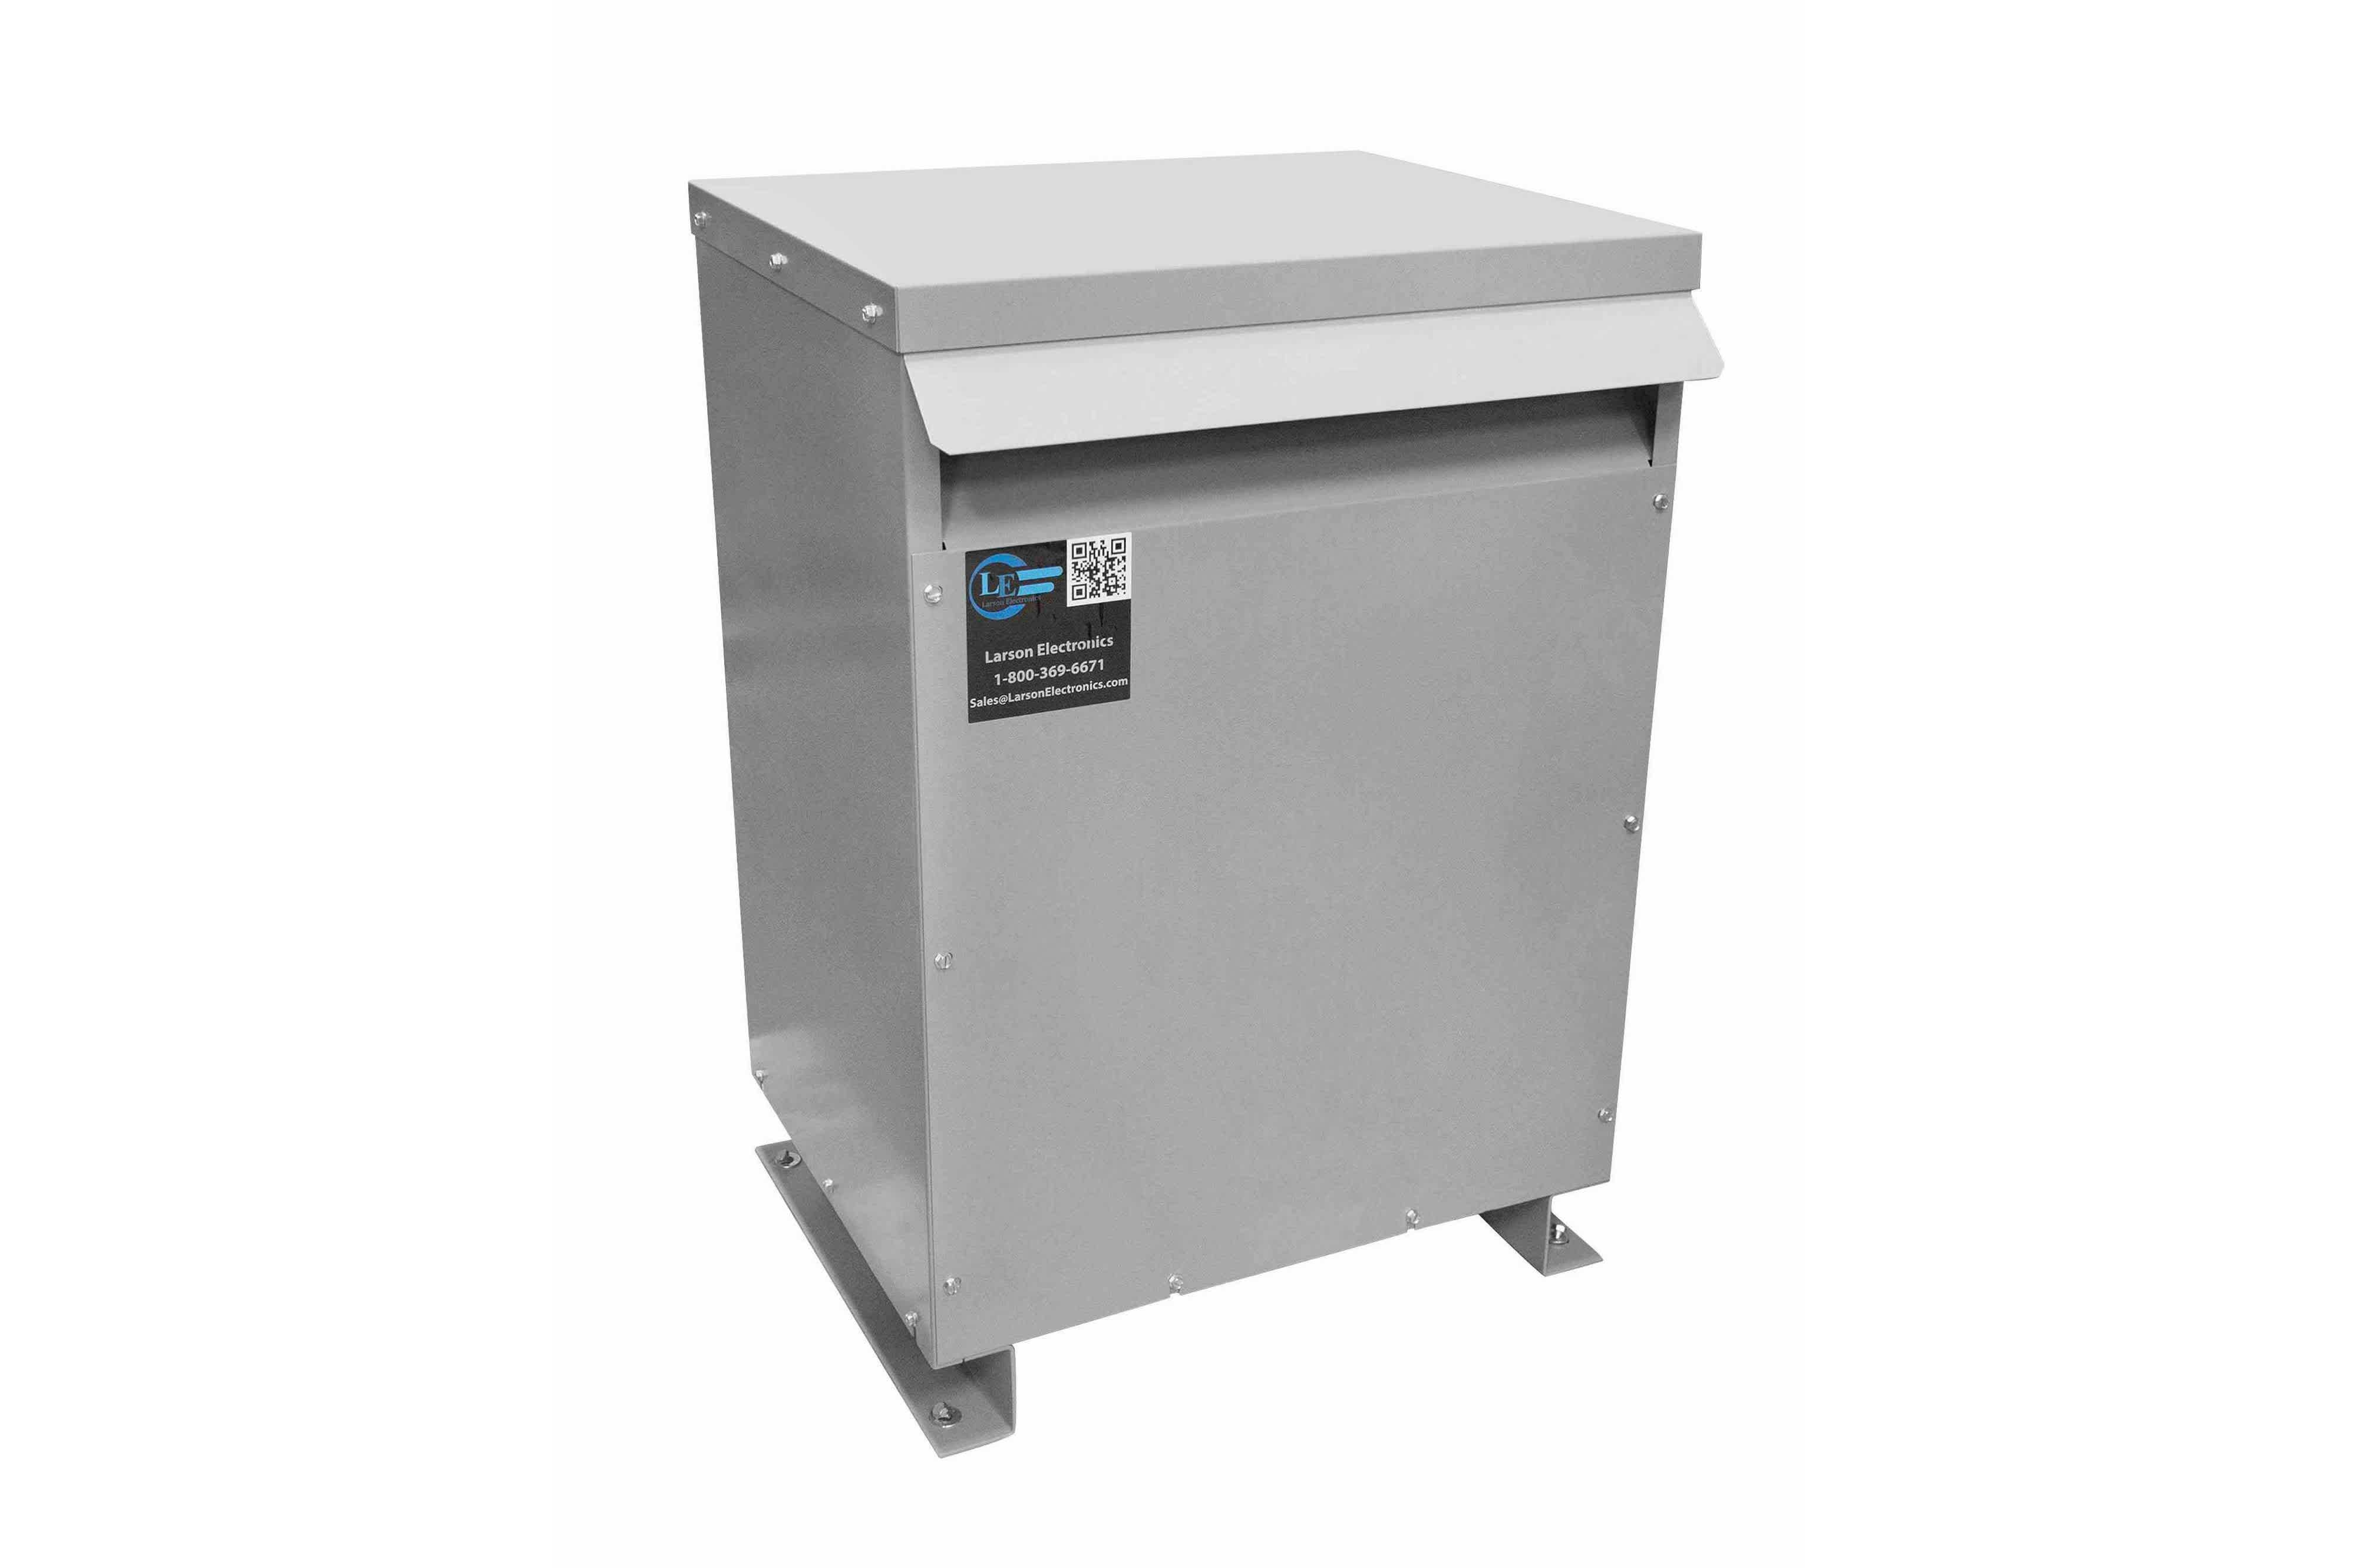 200 kVA 3PH Isolation Transformer, 460V Wye Primary, 415Y/240 Wye-N Secondary, N3R, Ventilated, 60 Hz